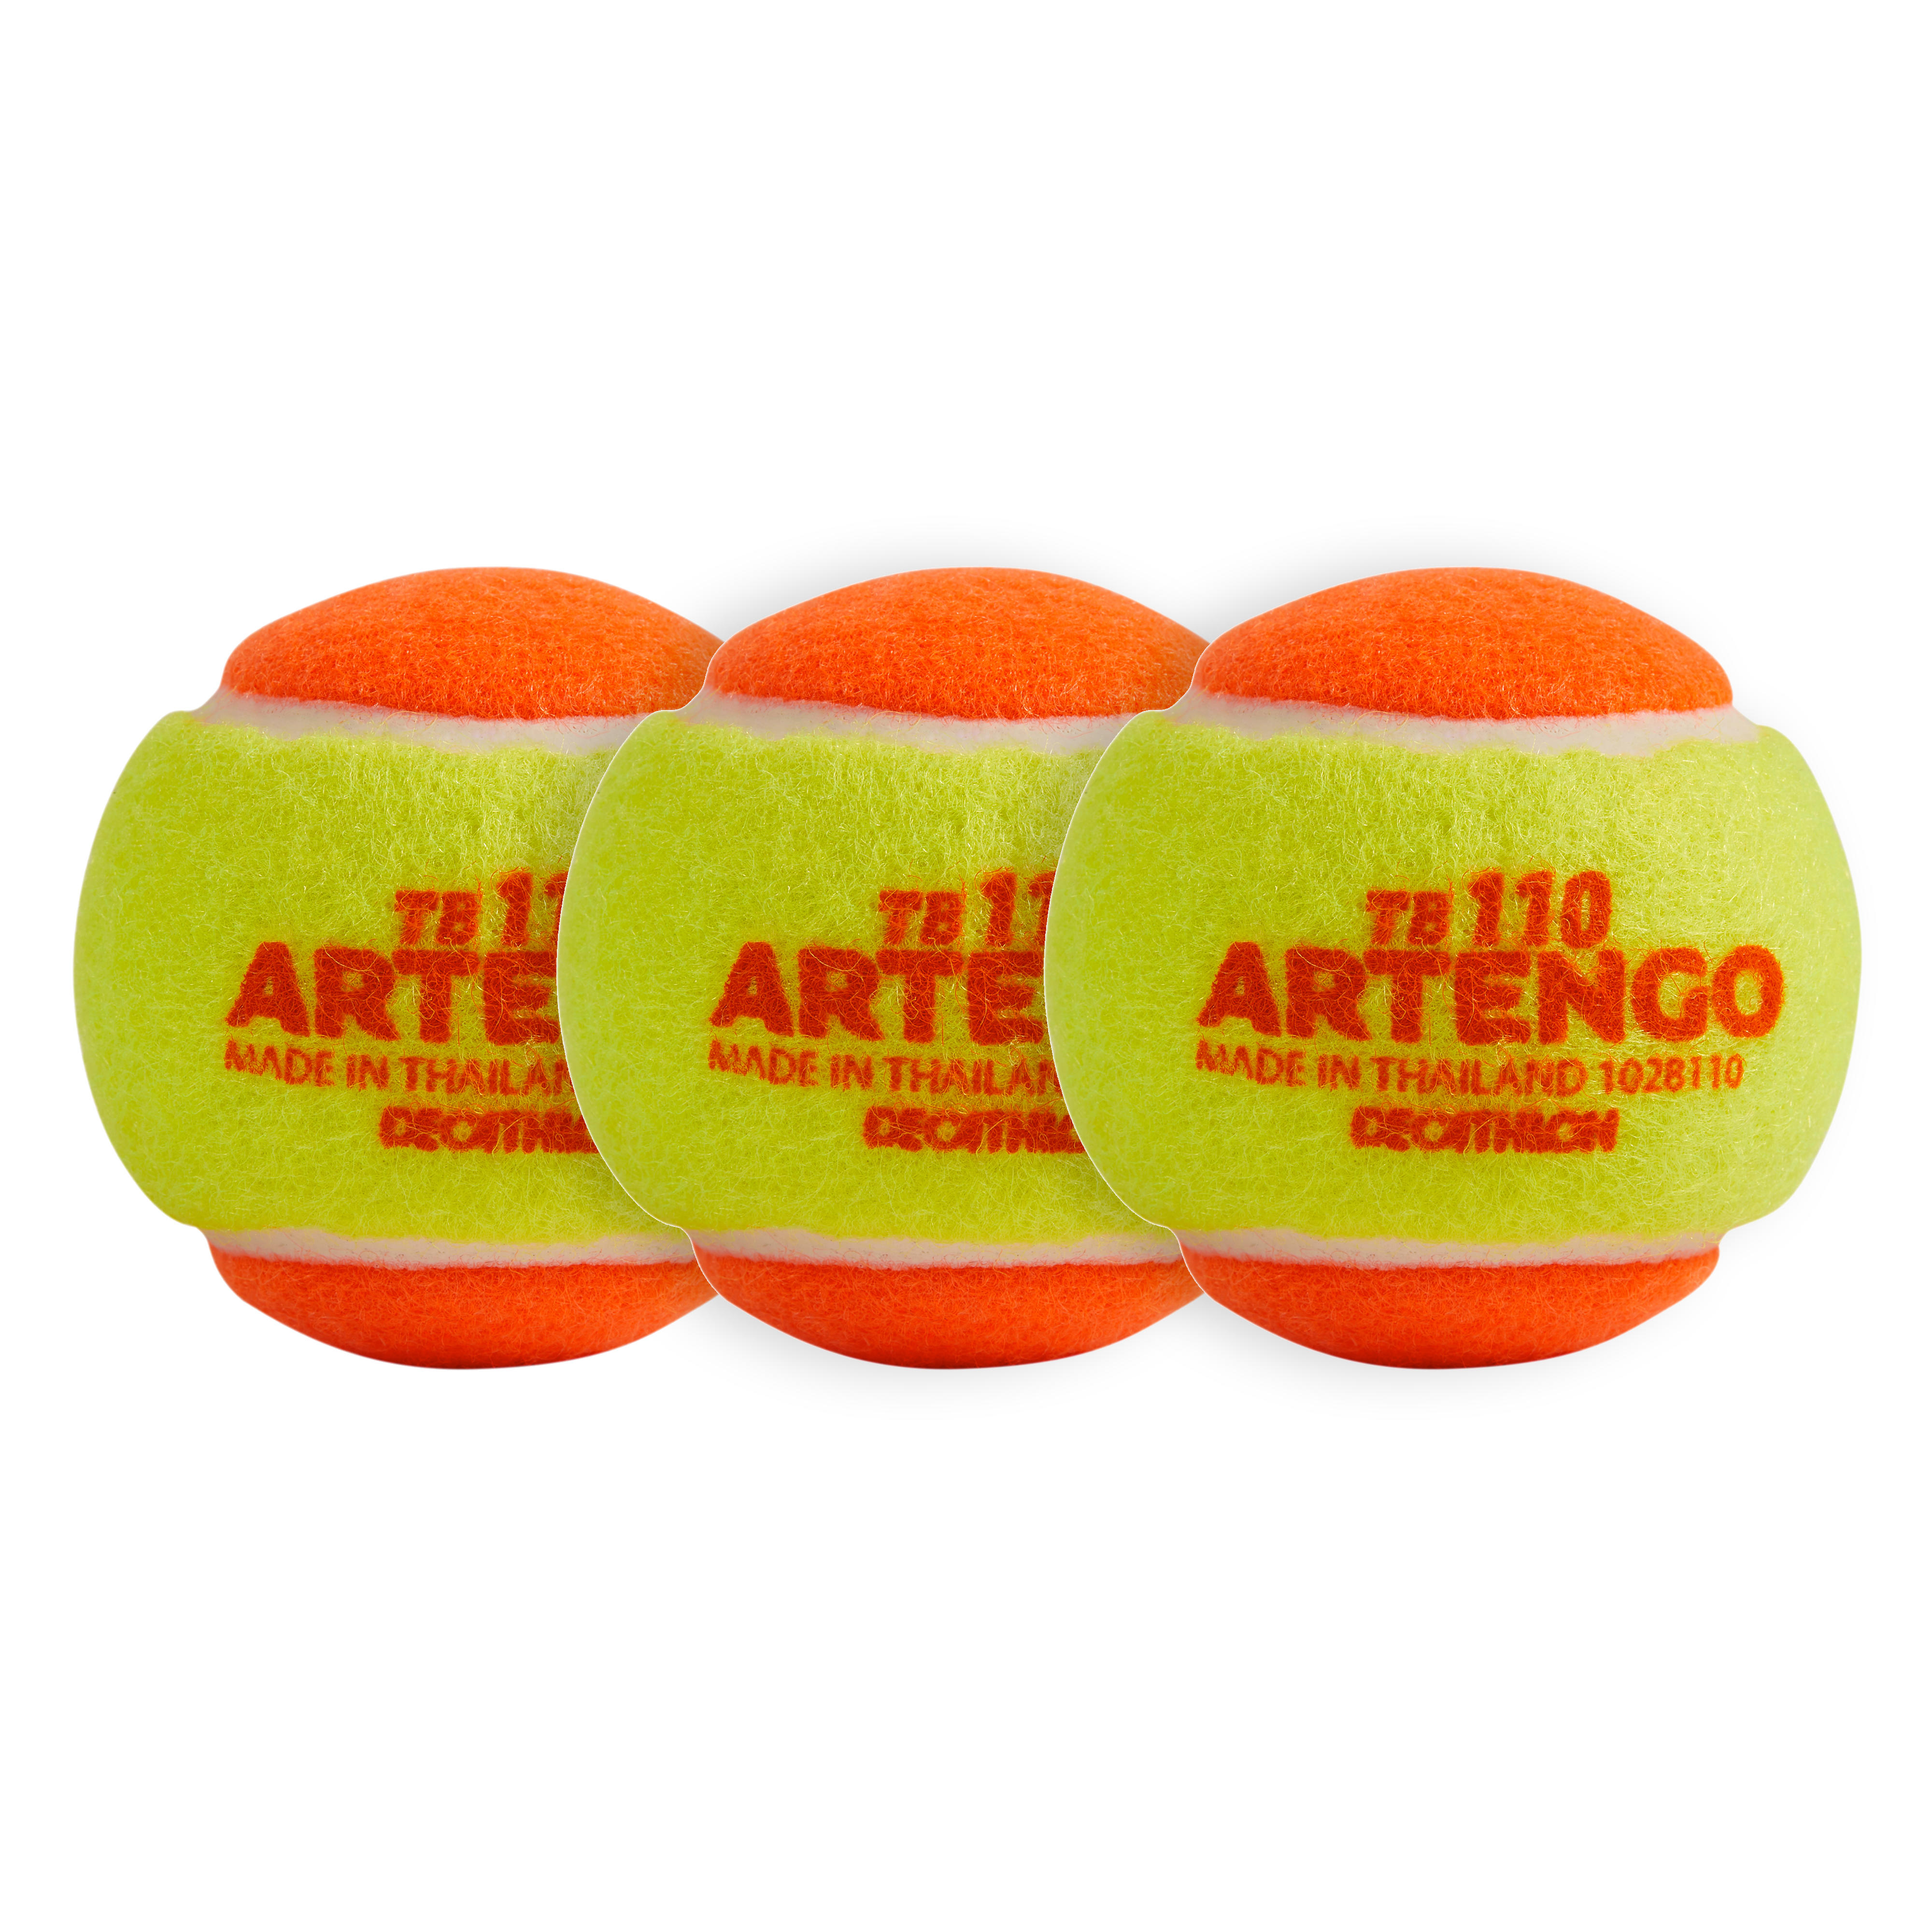 TB110 Tennis Balls...